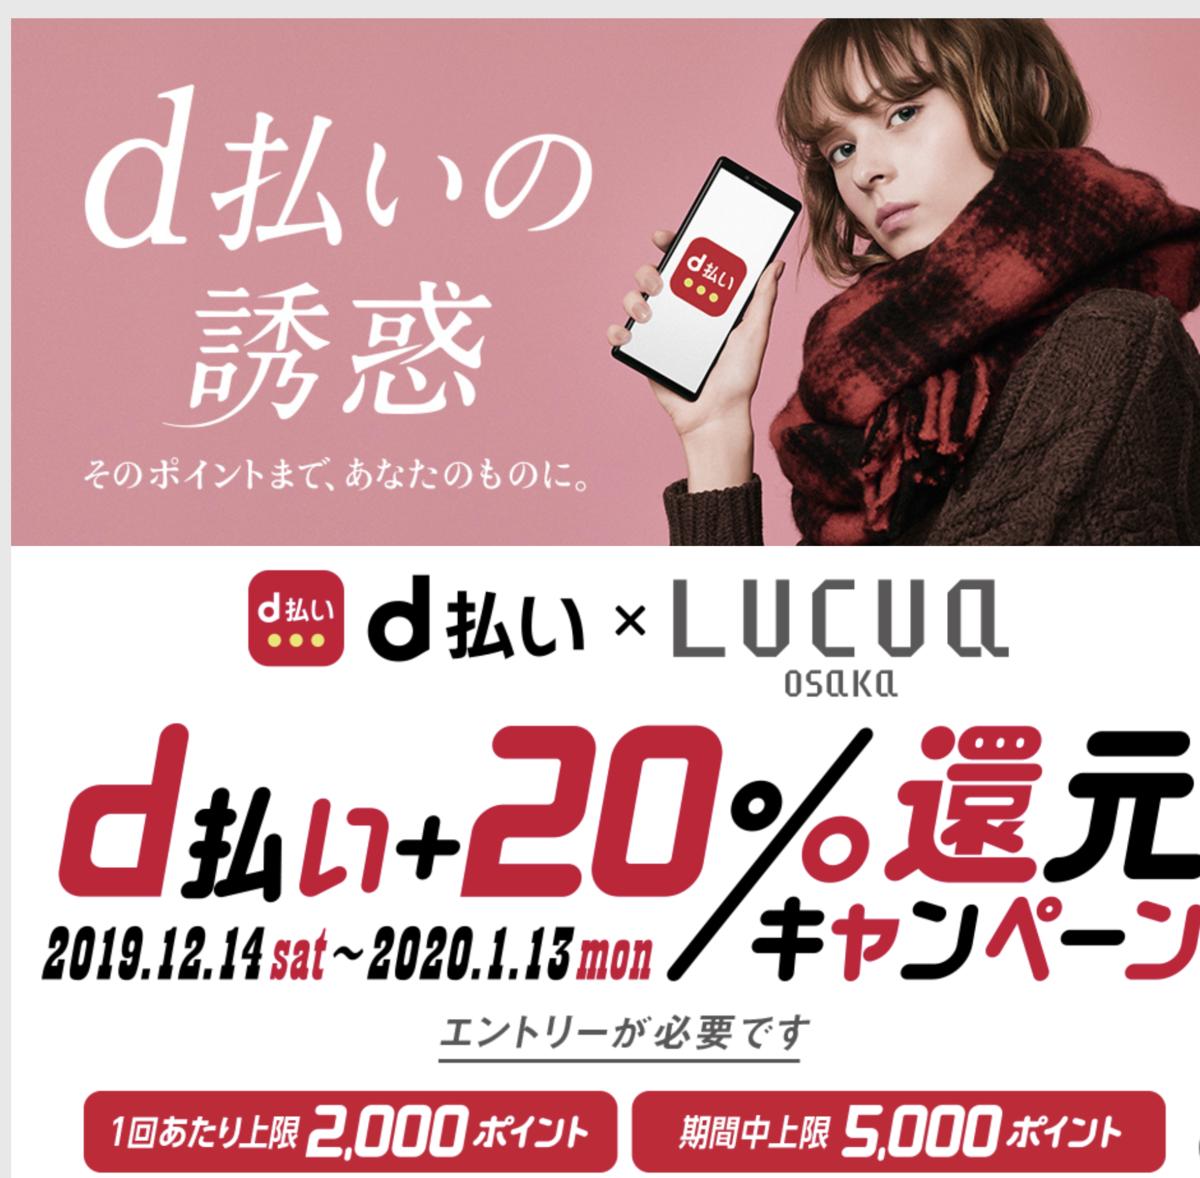 f:id:shingo-sakuragi:20191216221503p:plain